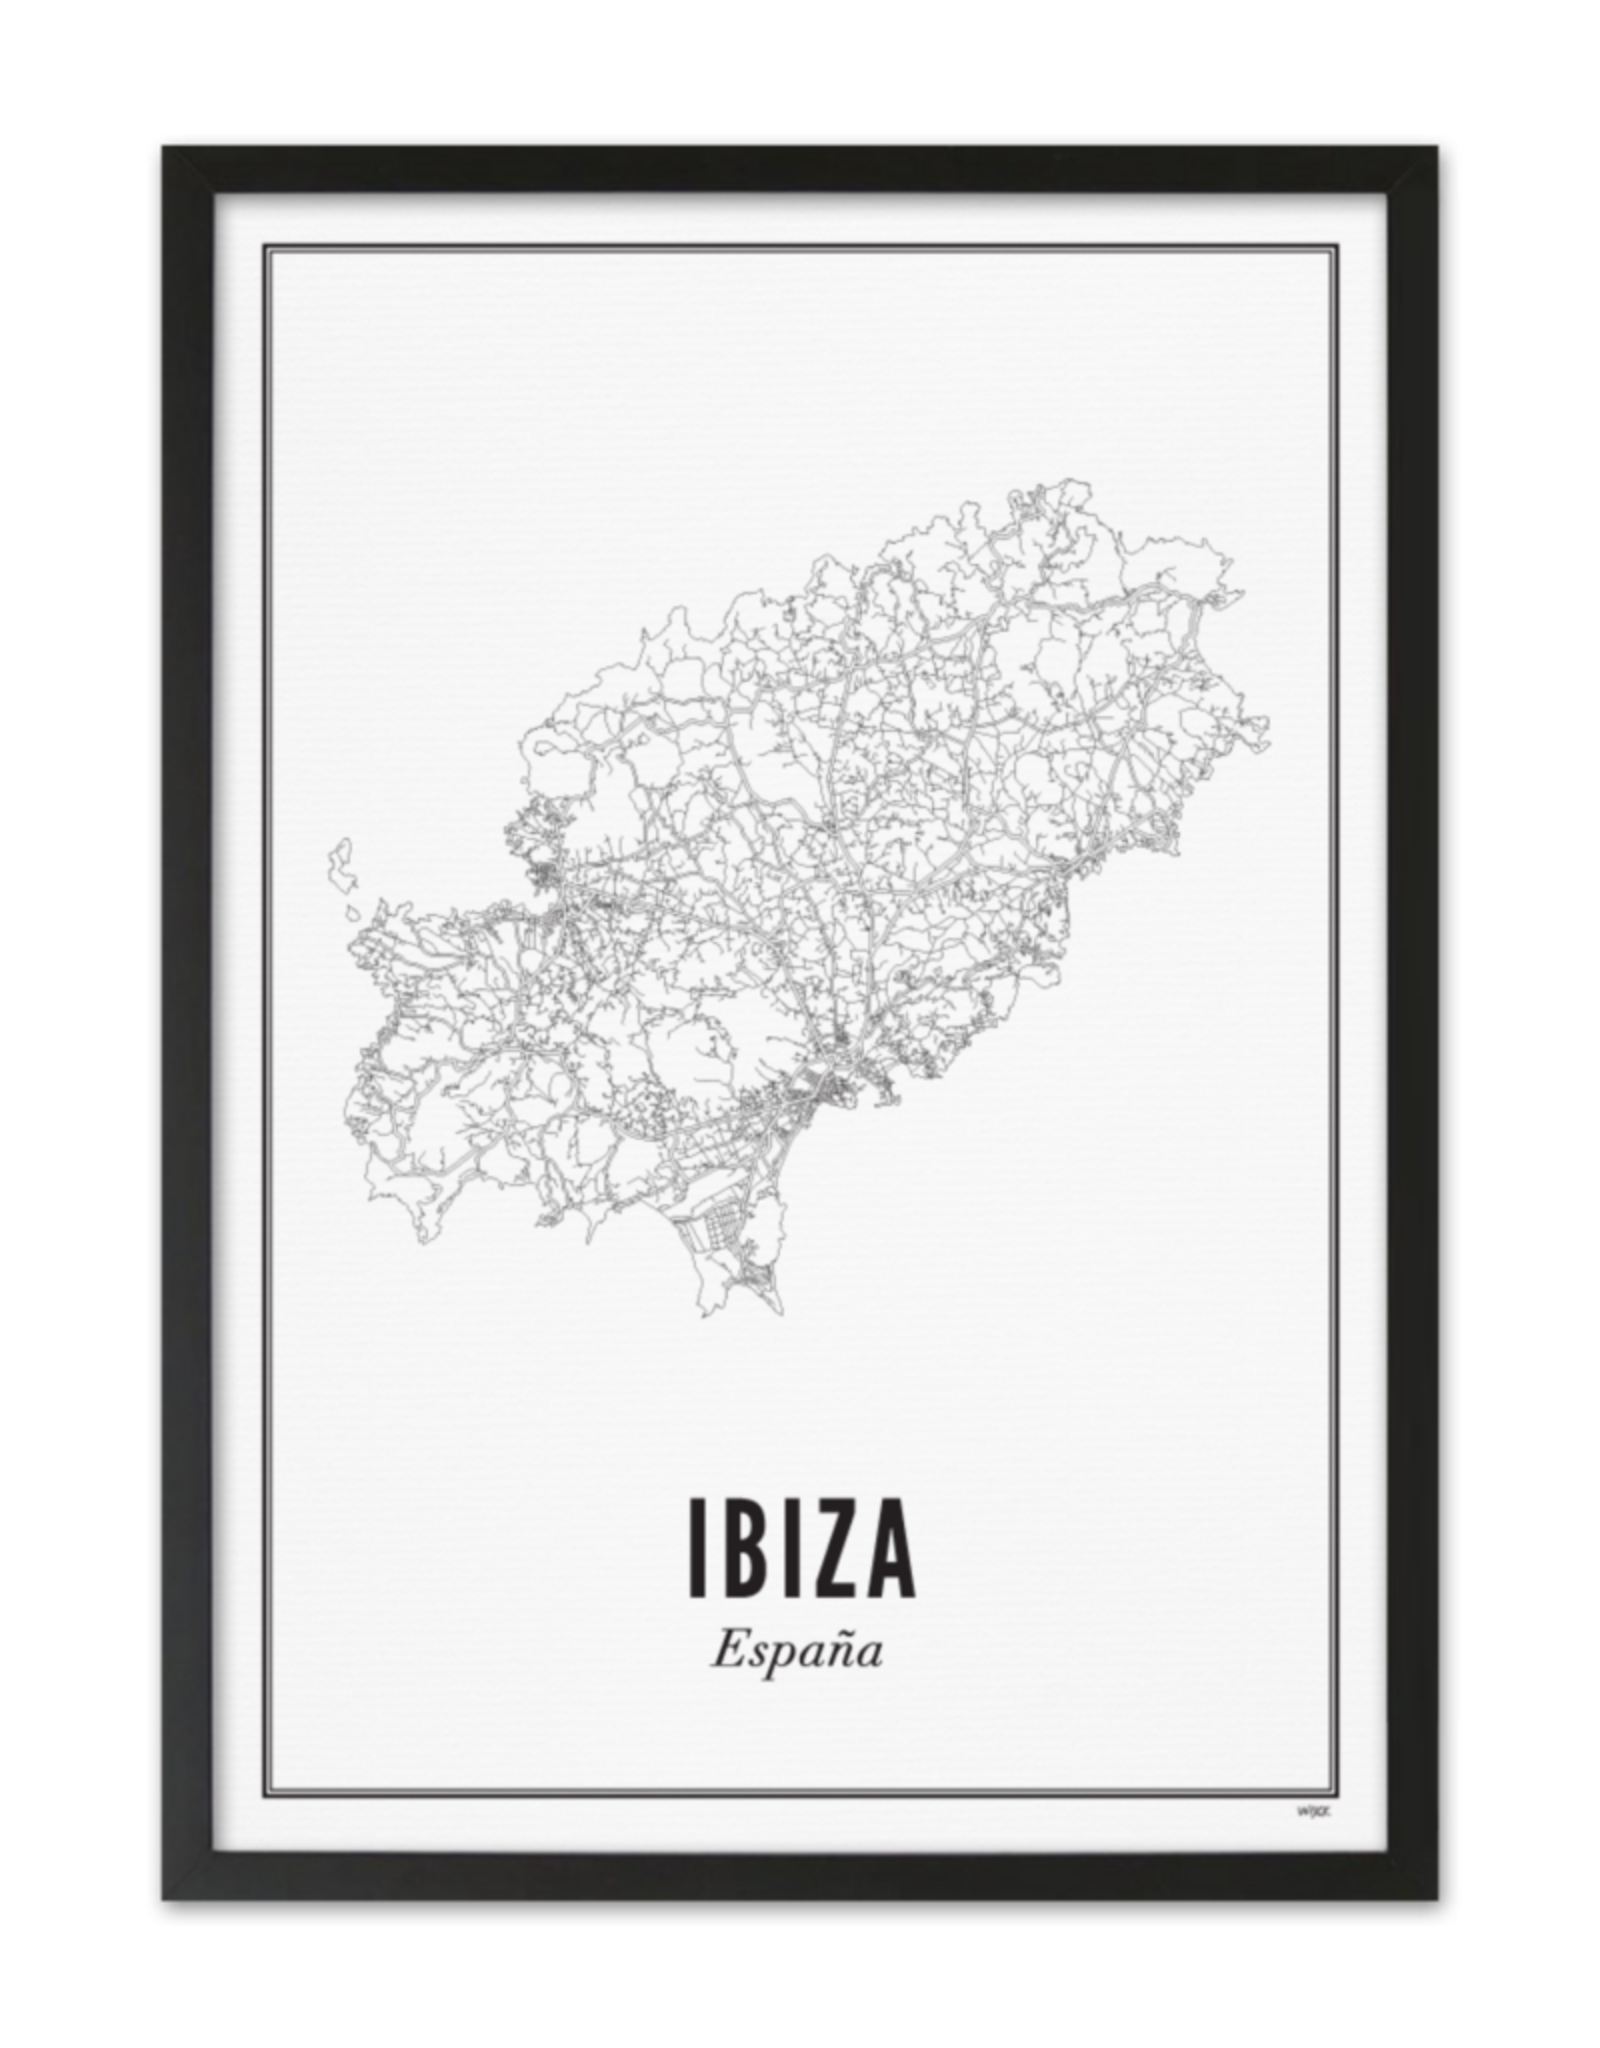 Wijck Wijck - prints - 40x50 - Ibiza